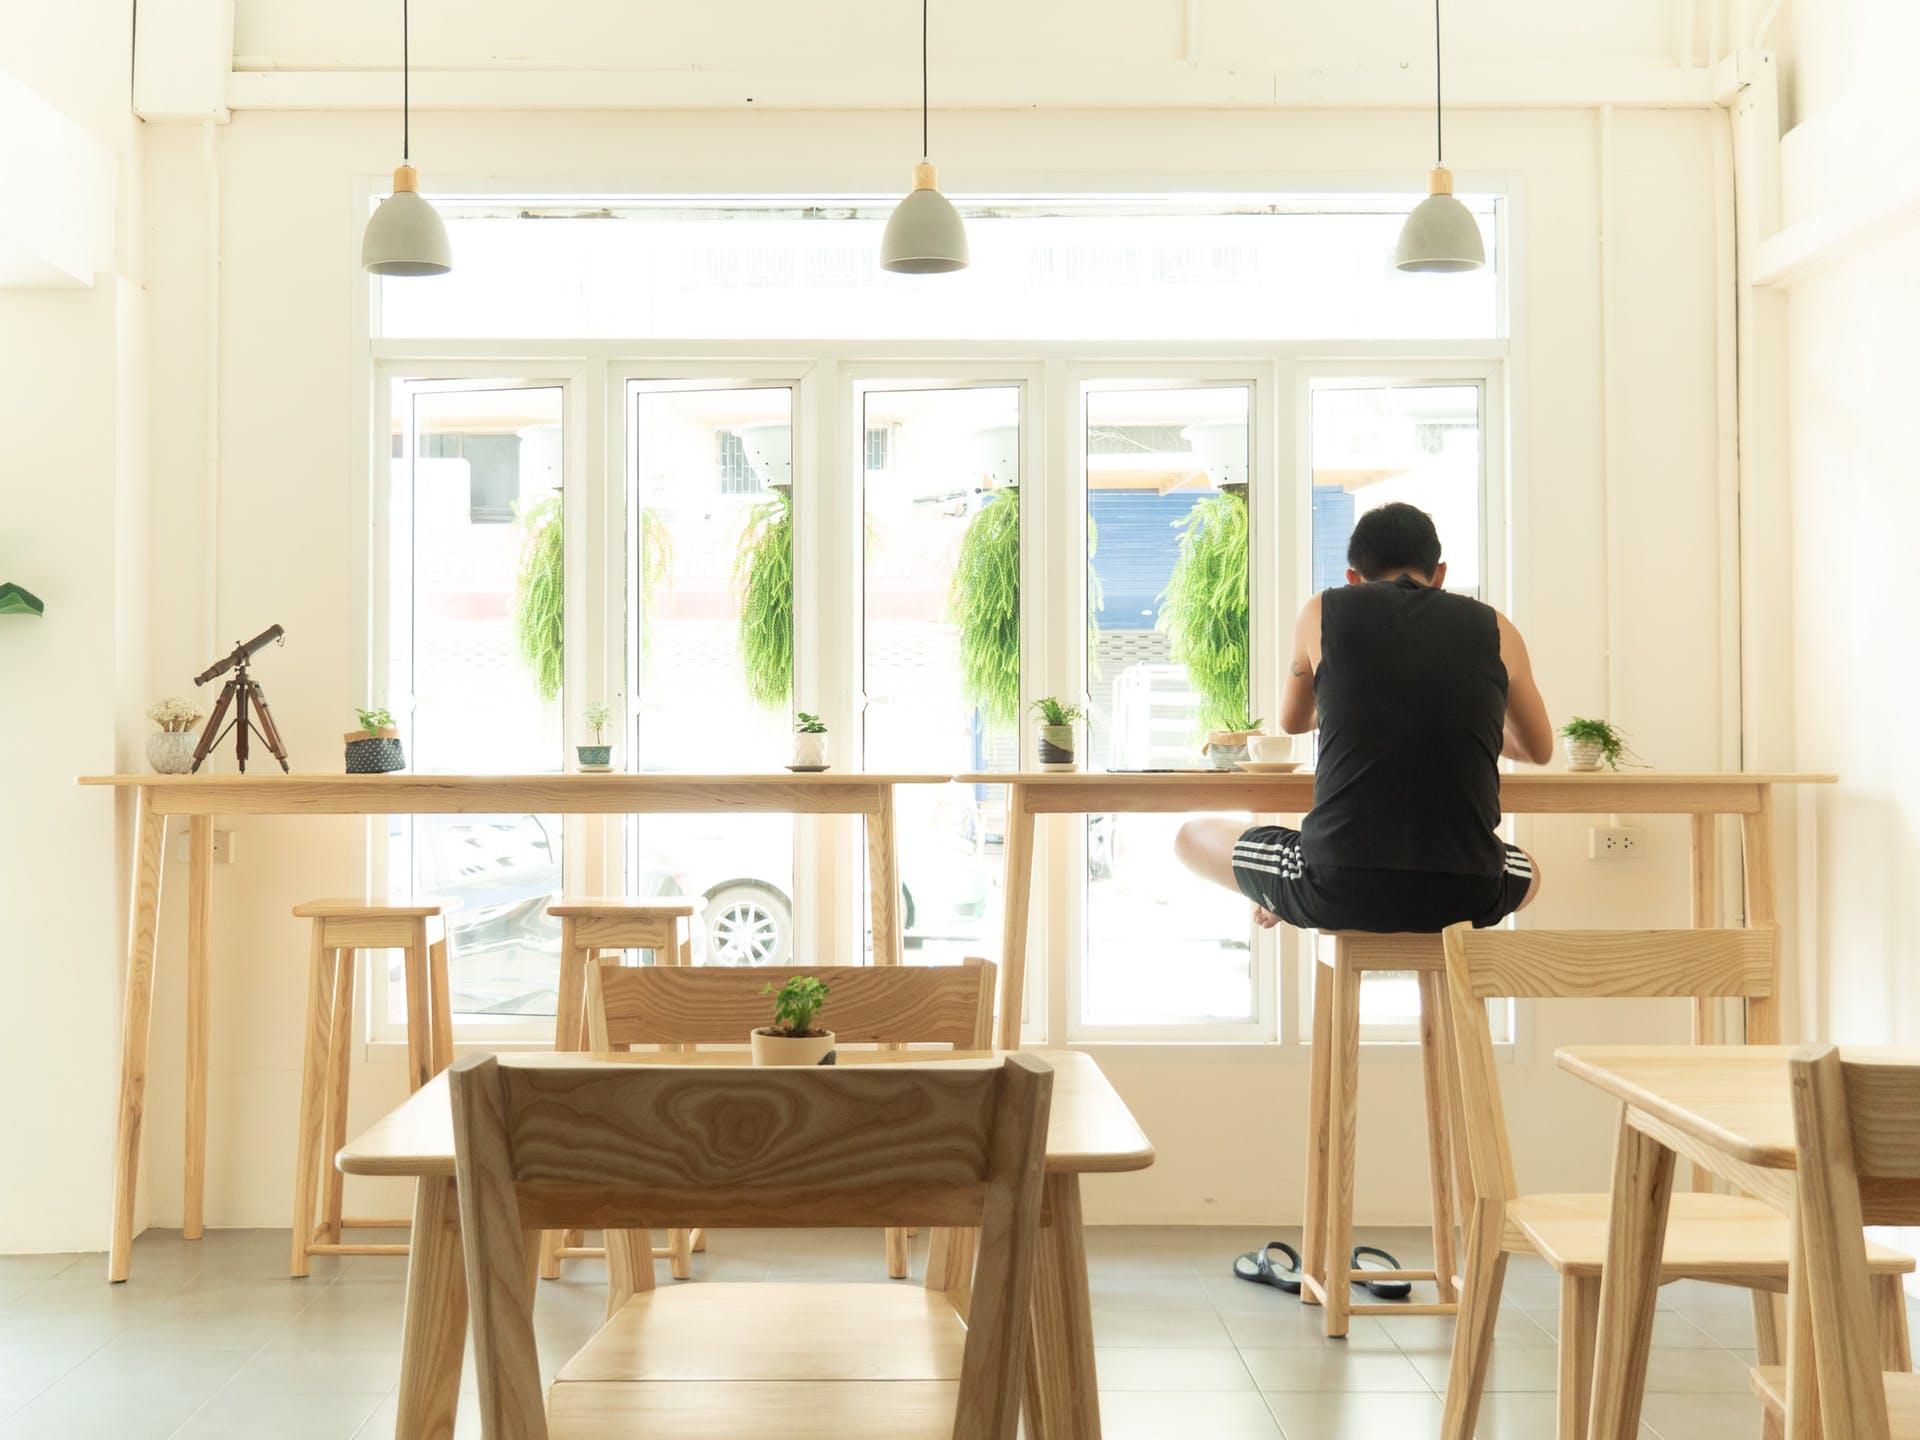 wooden glass windows modern coffee shop decor daytime vases chairs furnitures design